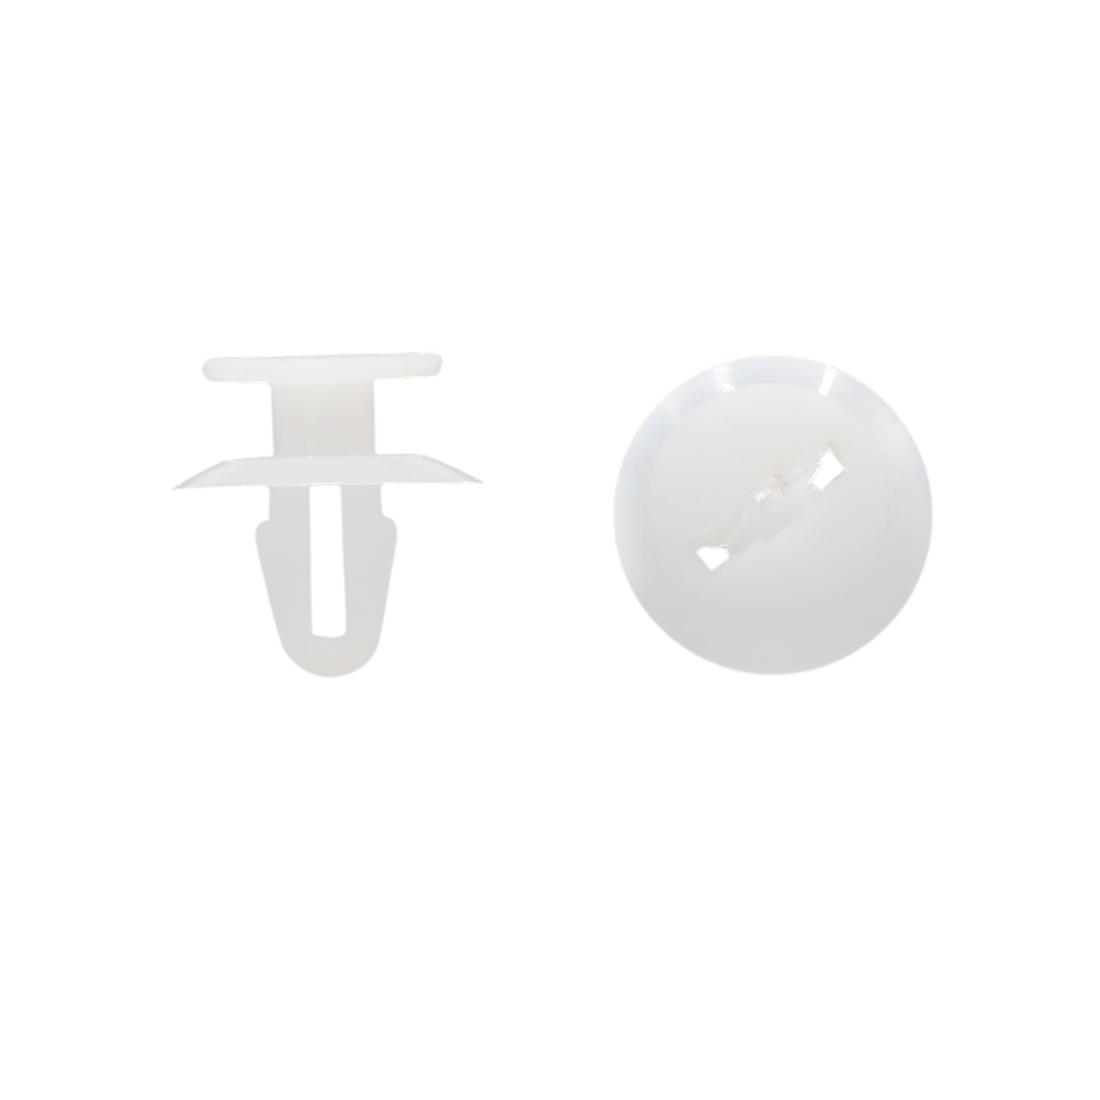 100pcs 6mm Hole 12mm Head Plastic Rivets Fastener Push Clips White for Car